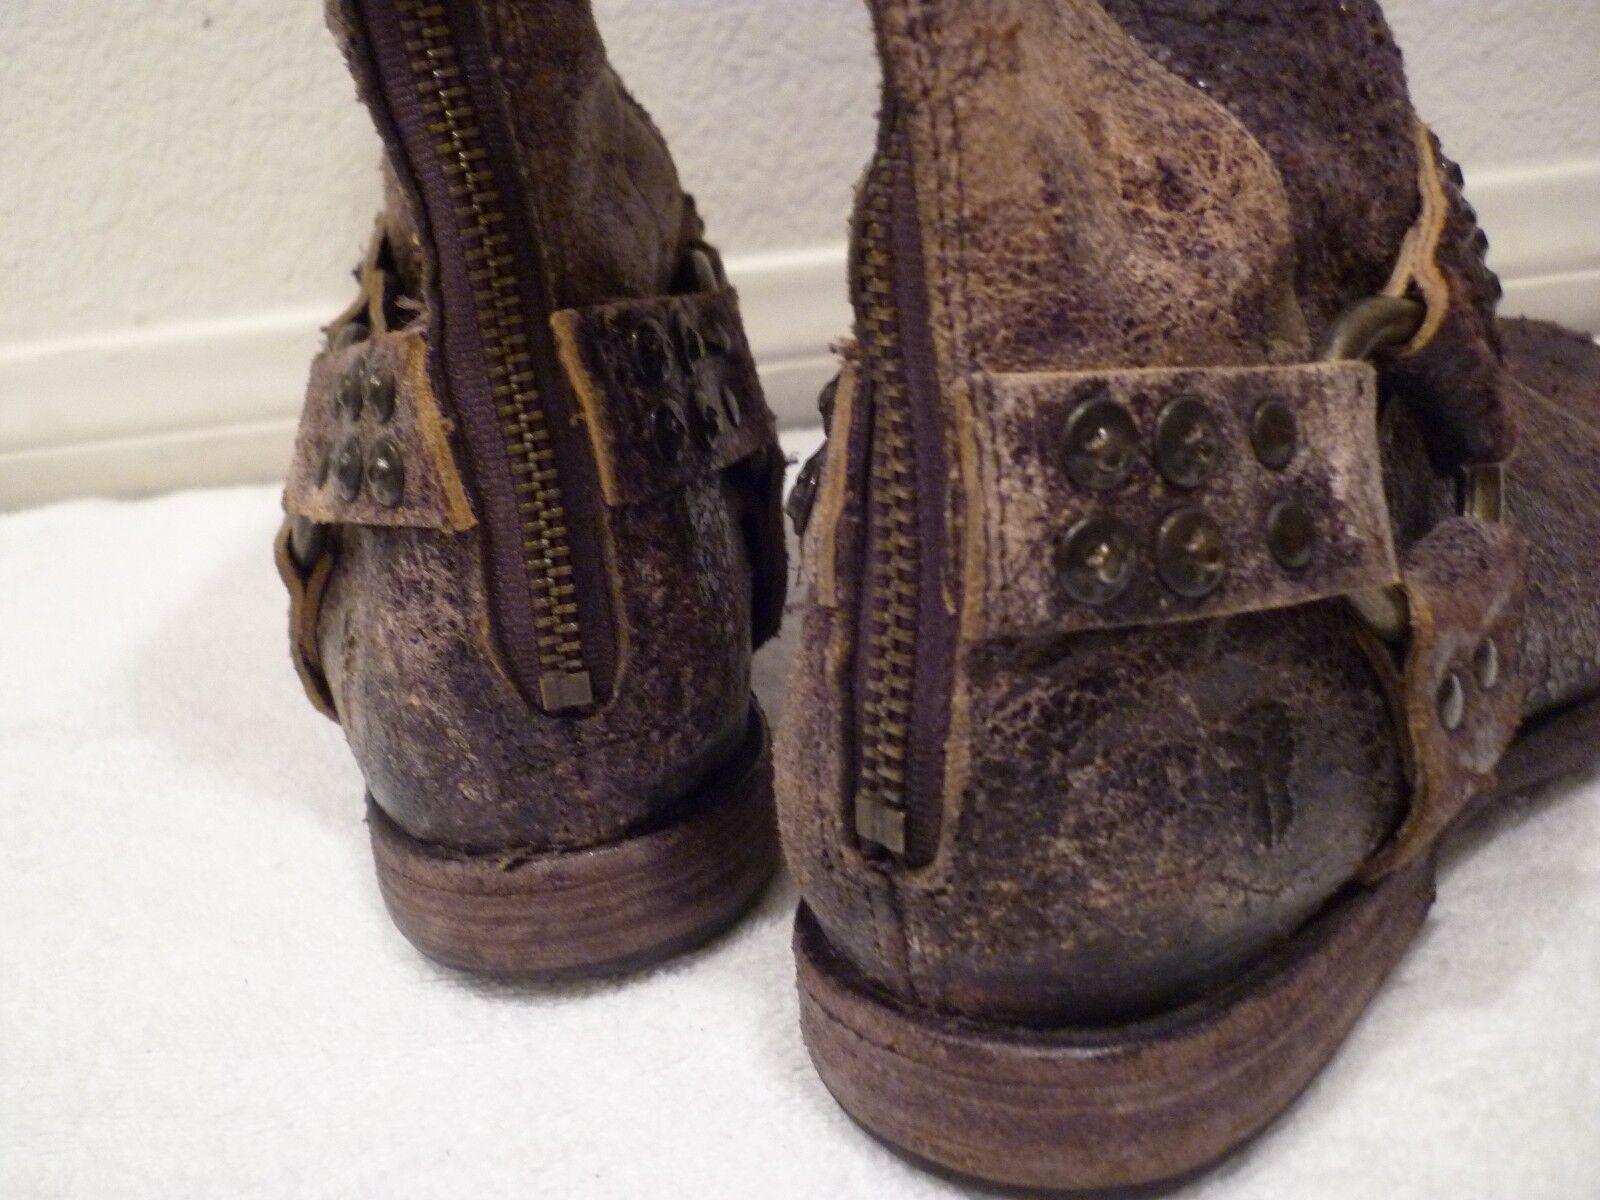 $398 Distressed FRYE Tall Phillip Studded Distressed $398 Chocolate Braun Harness Stiefel SZ 6.5 fb11c3